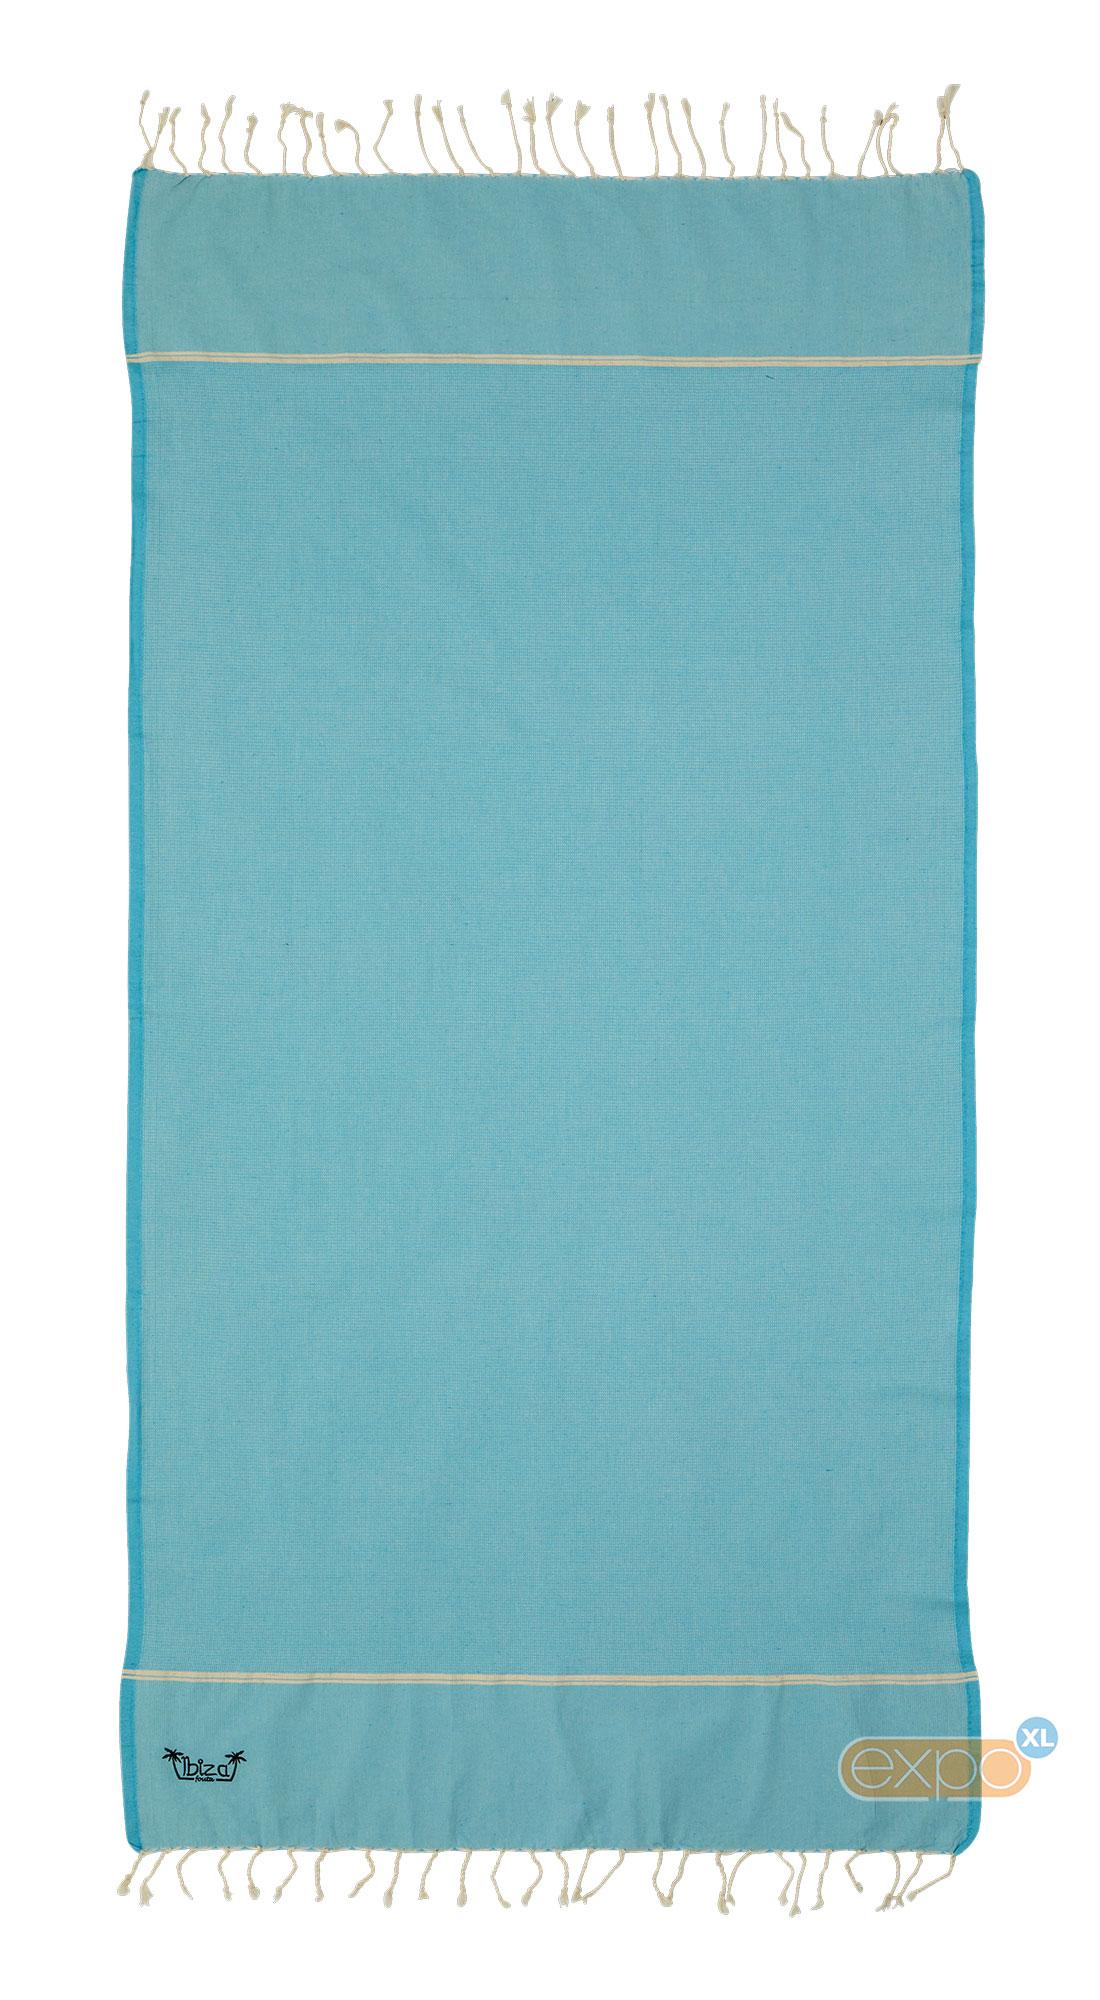 Expo XL Fouta Es Vedra - XL hamamdoek - turquoise